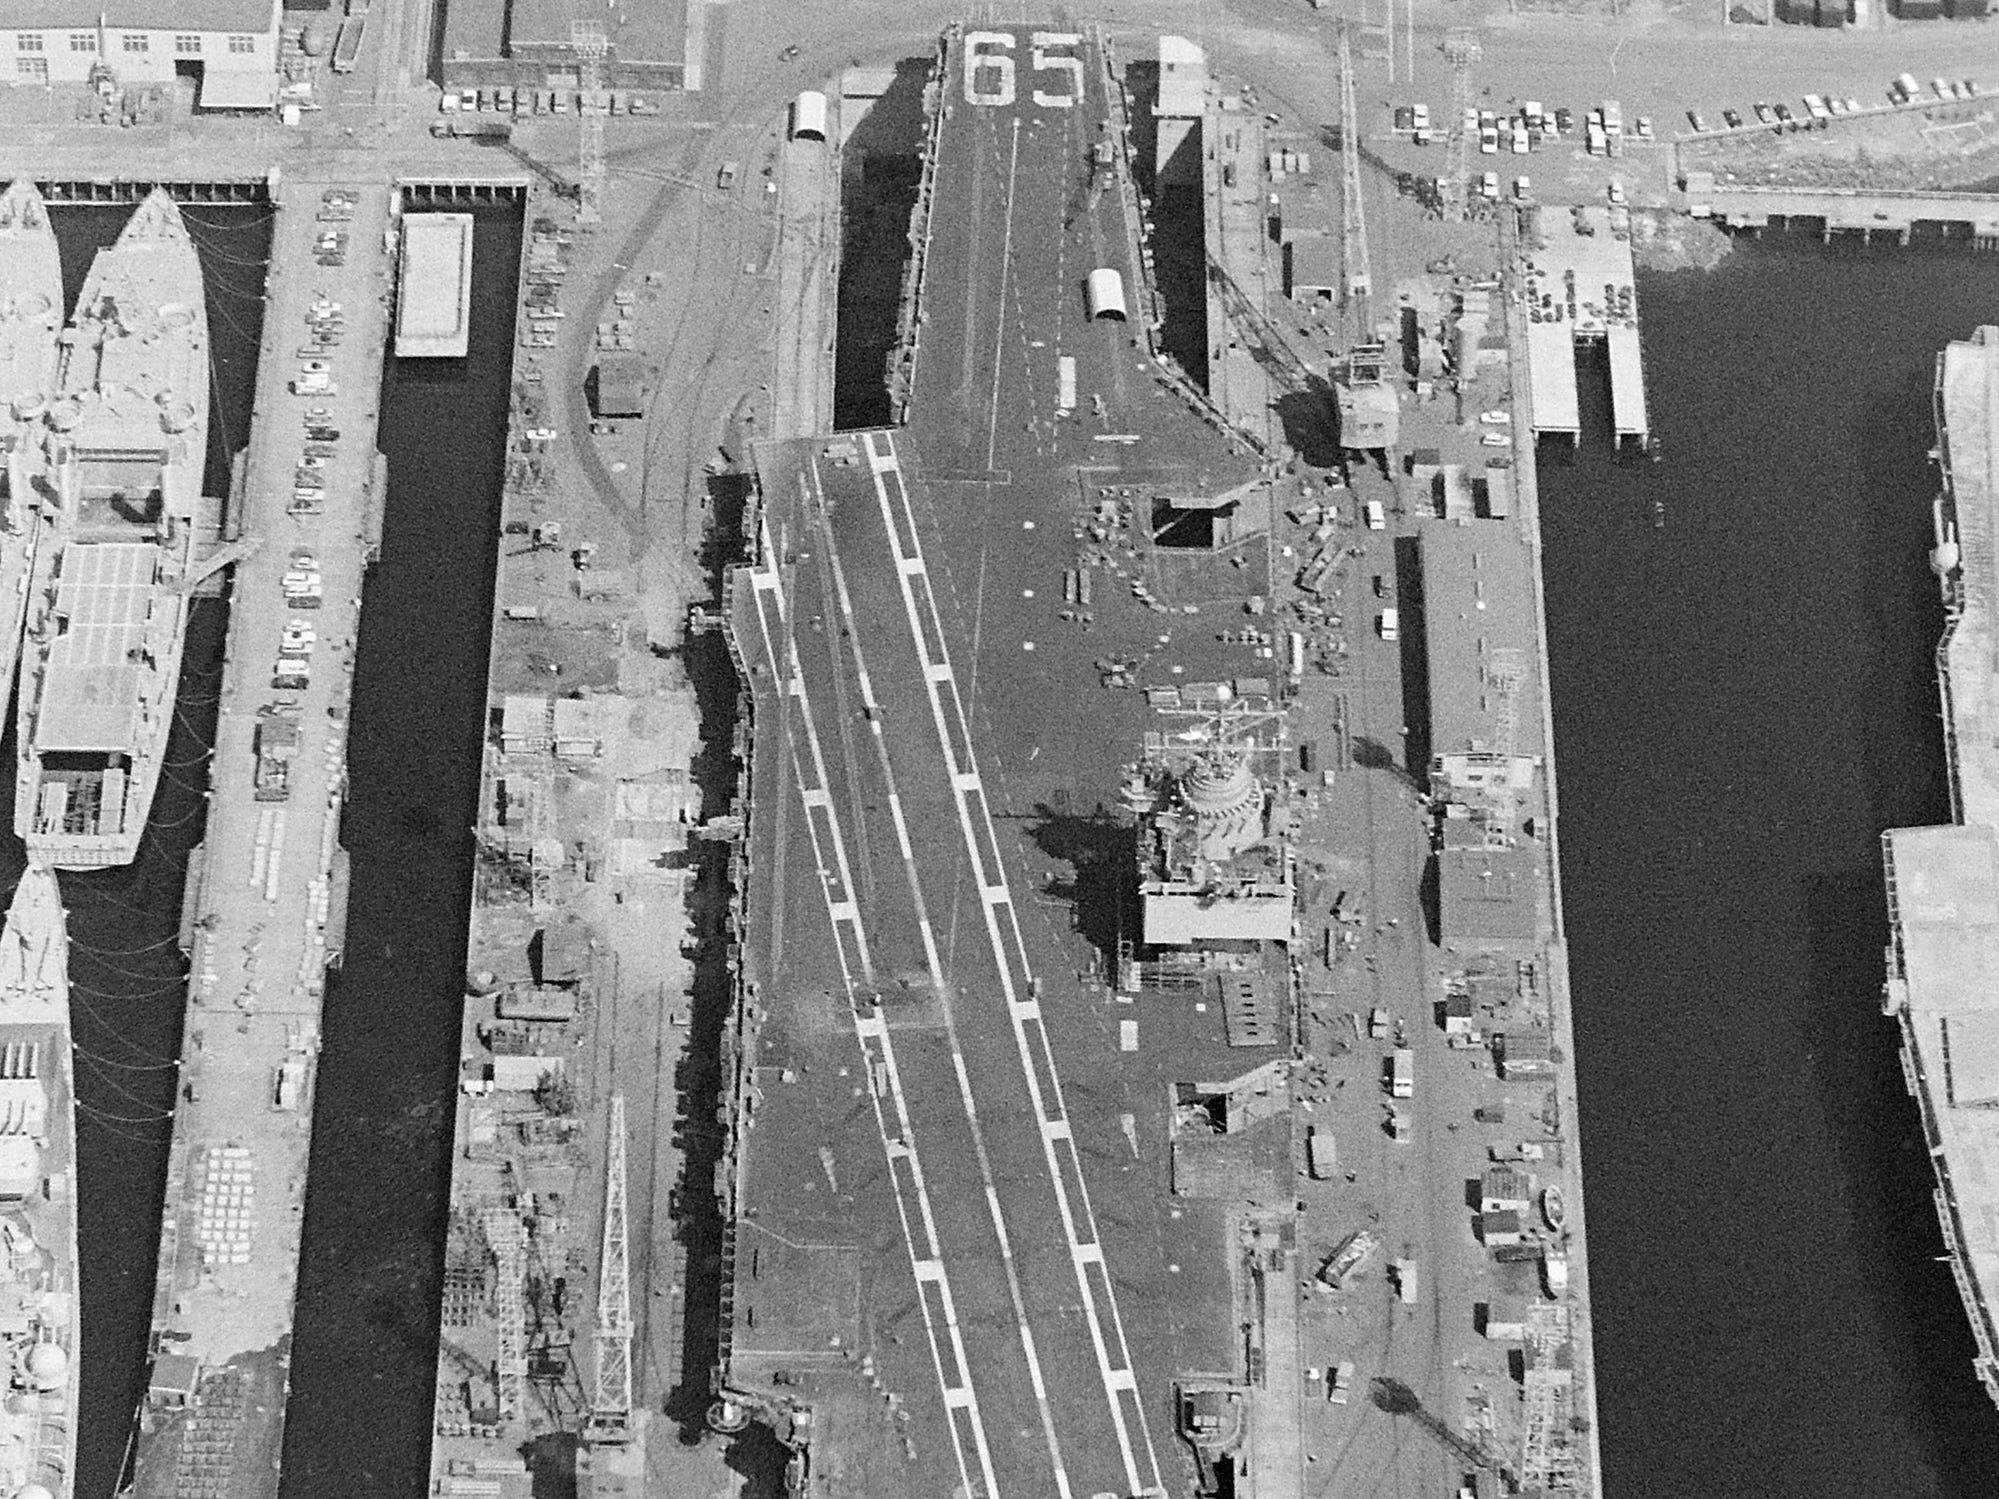 08/09/73Shipyard Aerial